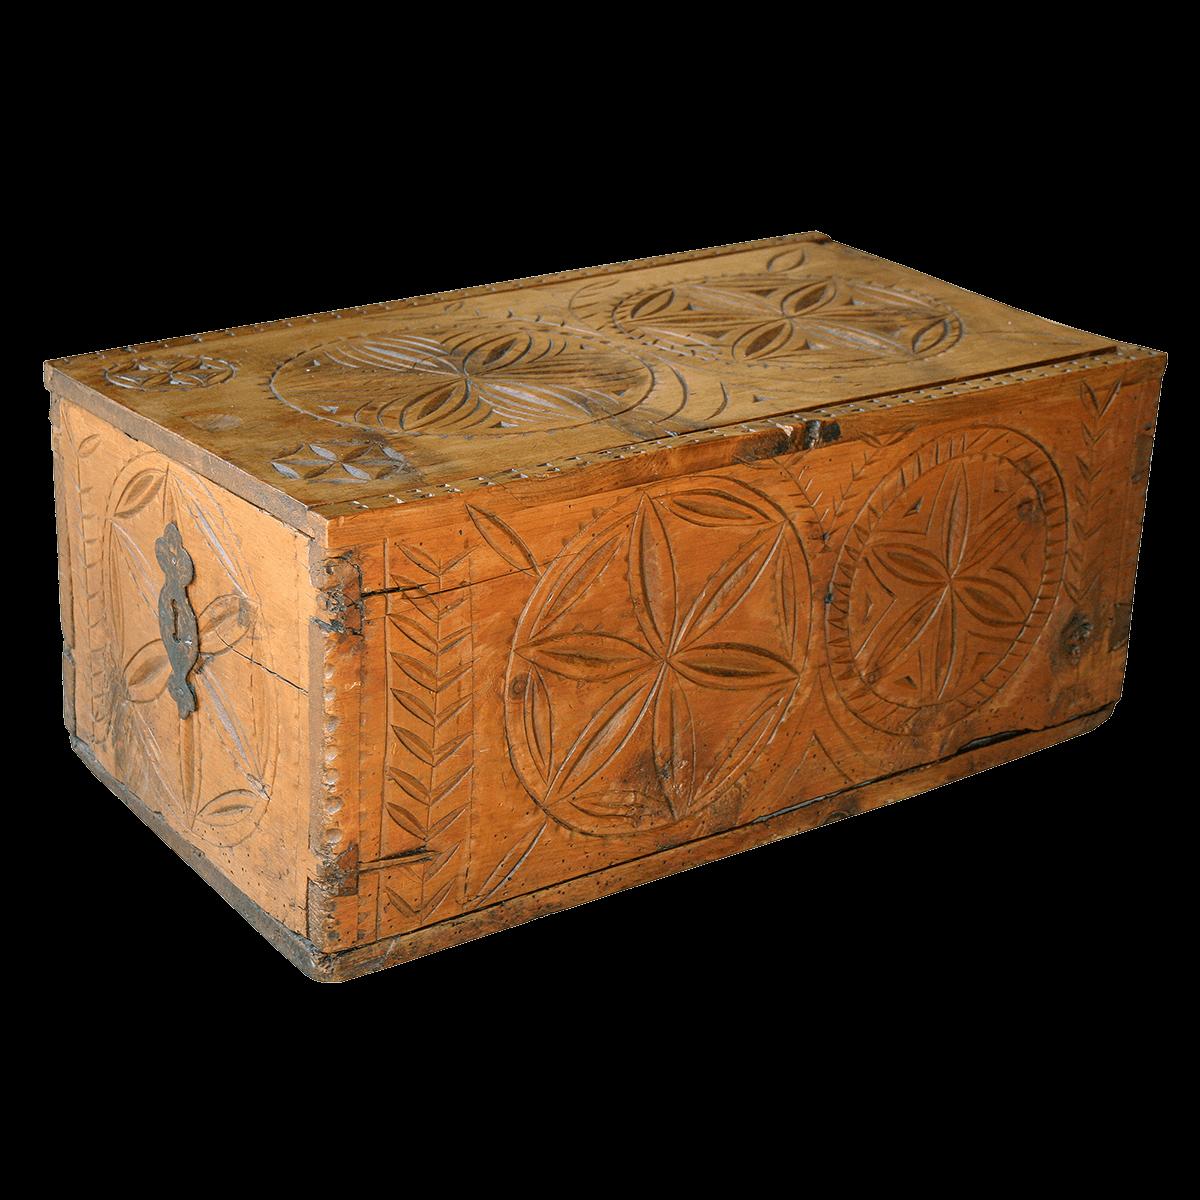 Rare boite sculptée